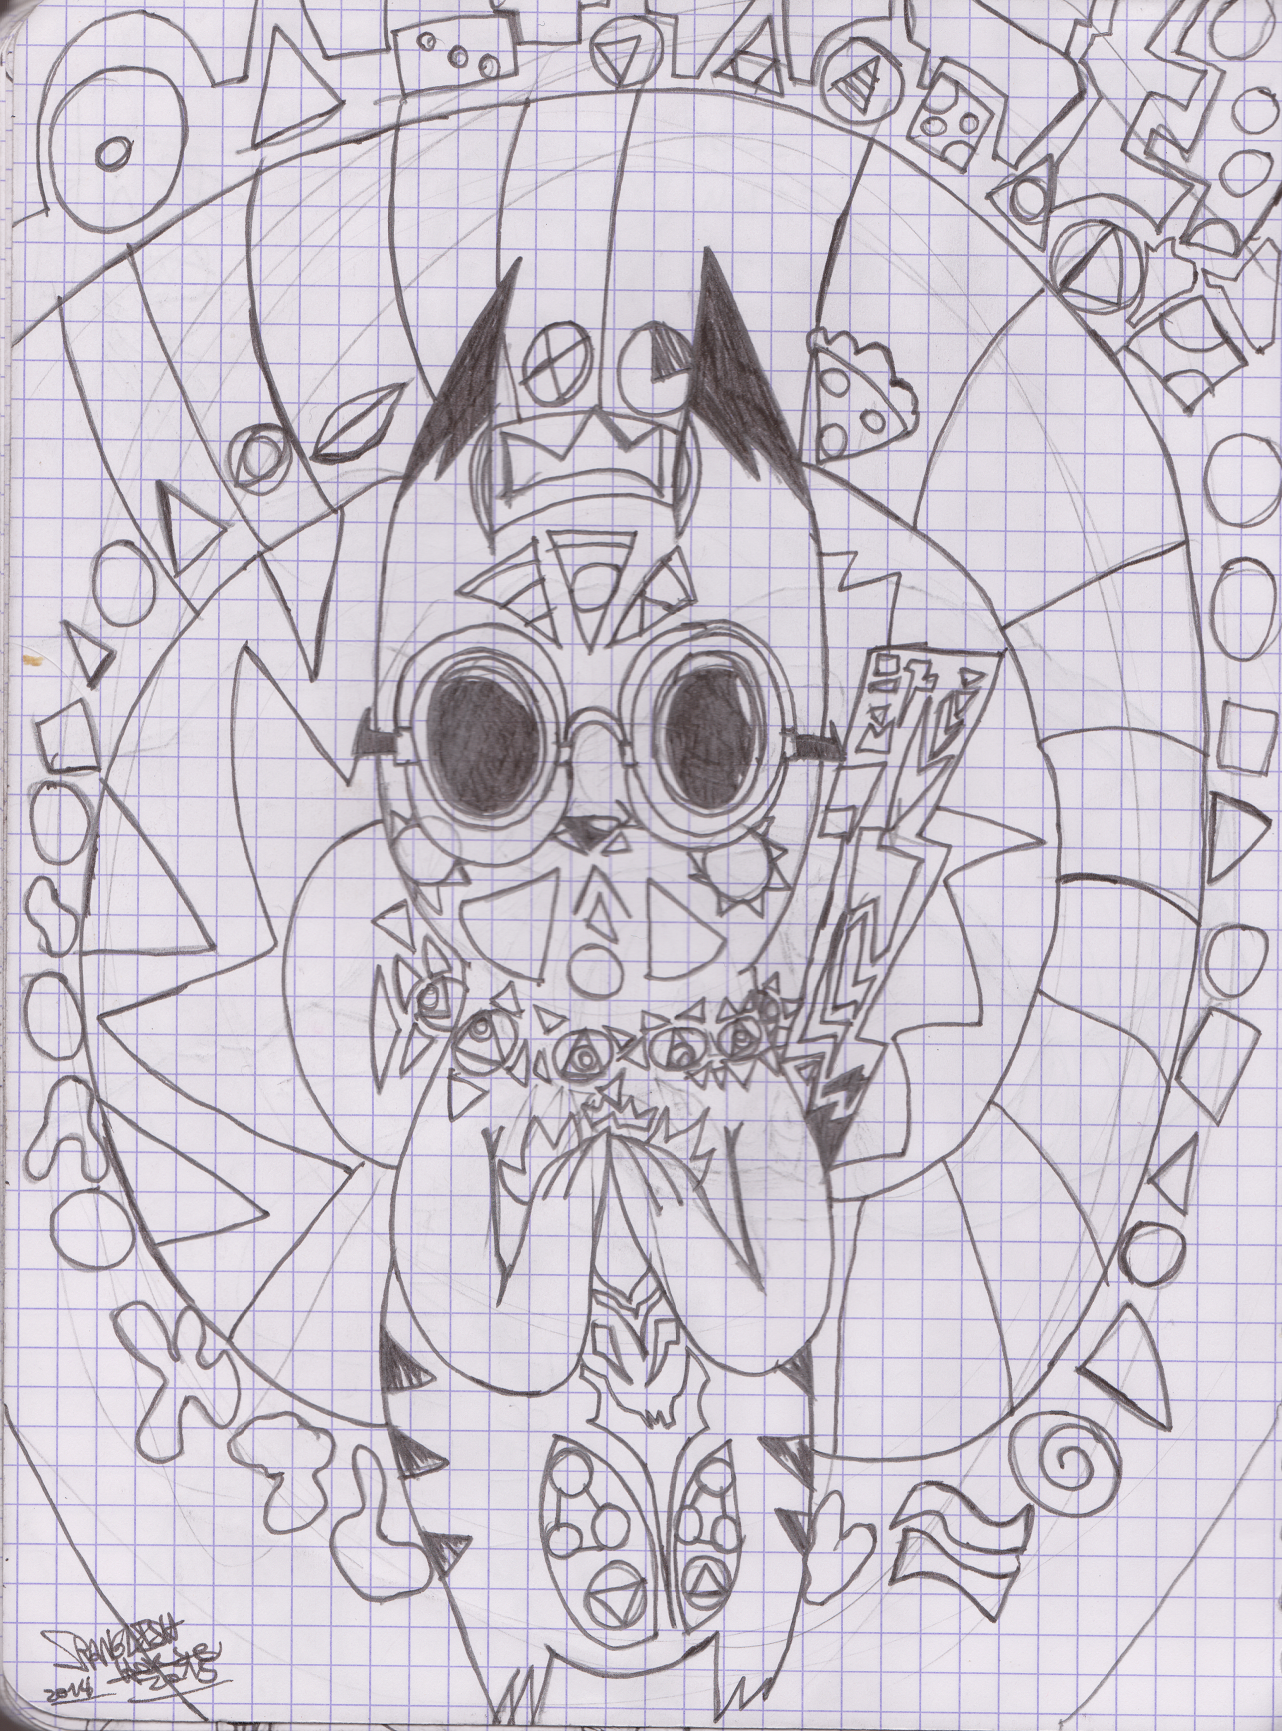 SH sketchbook page 35